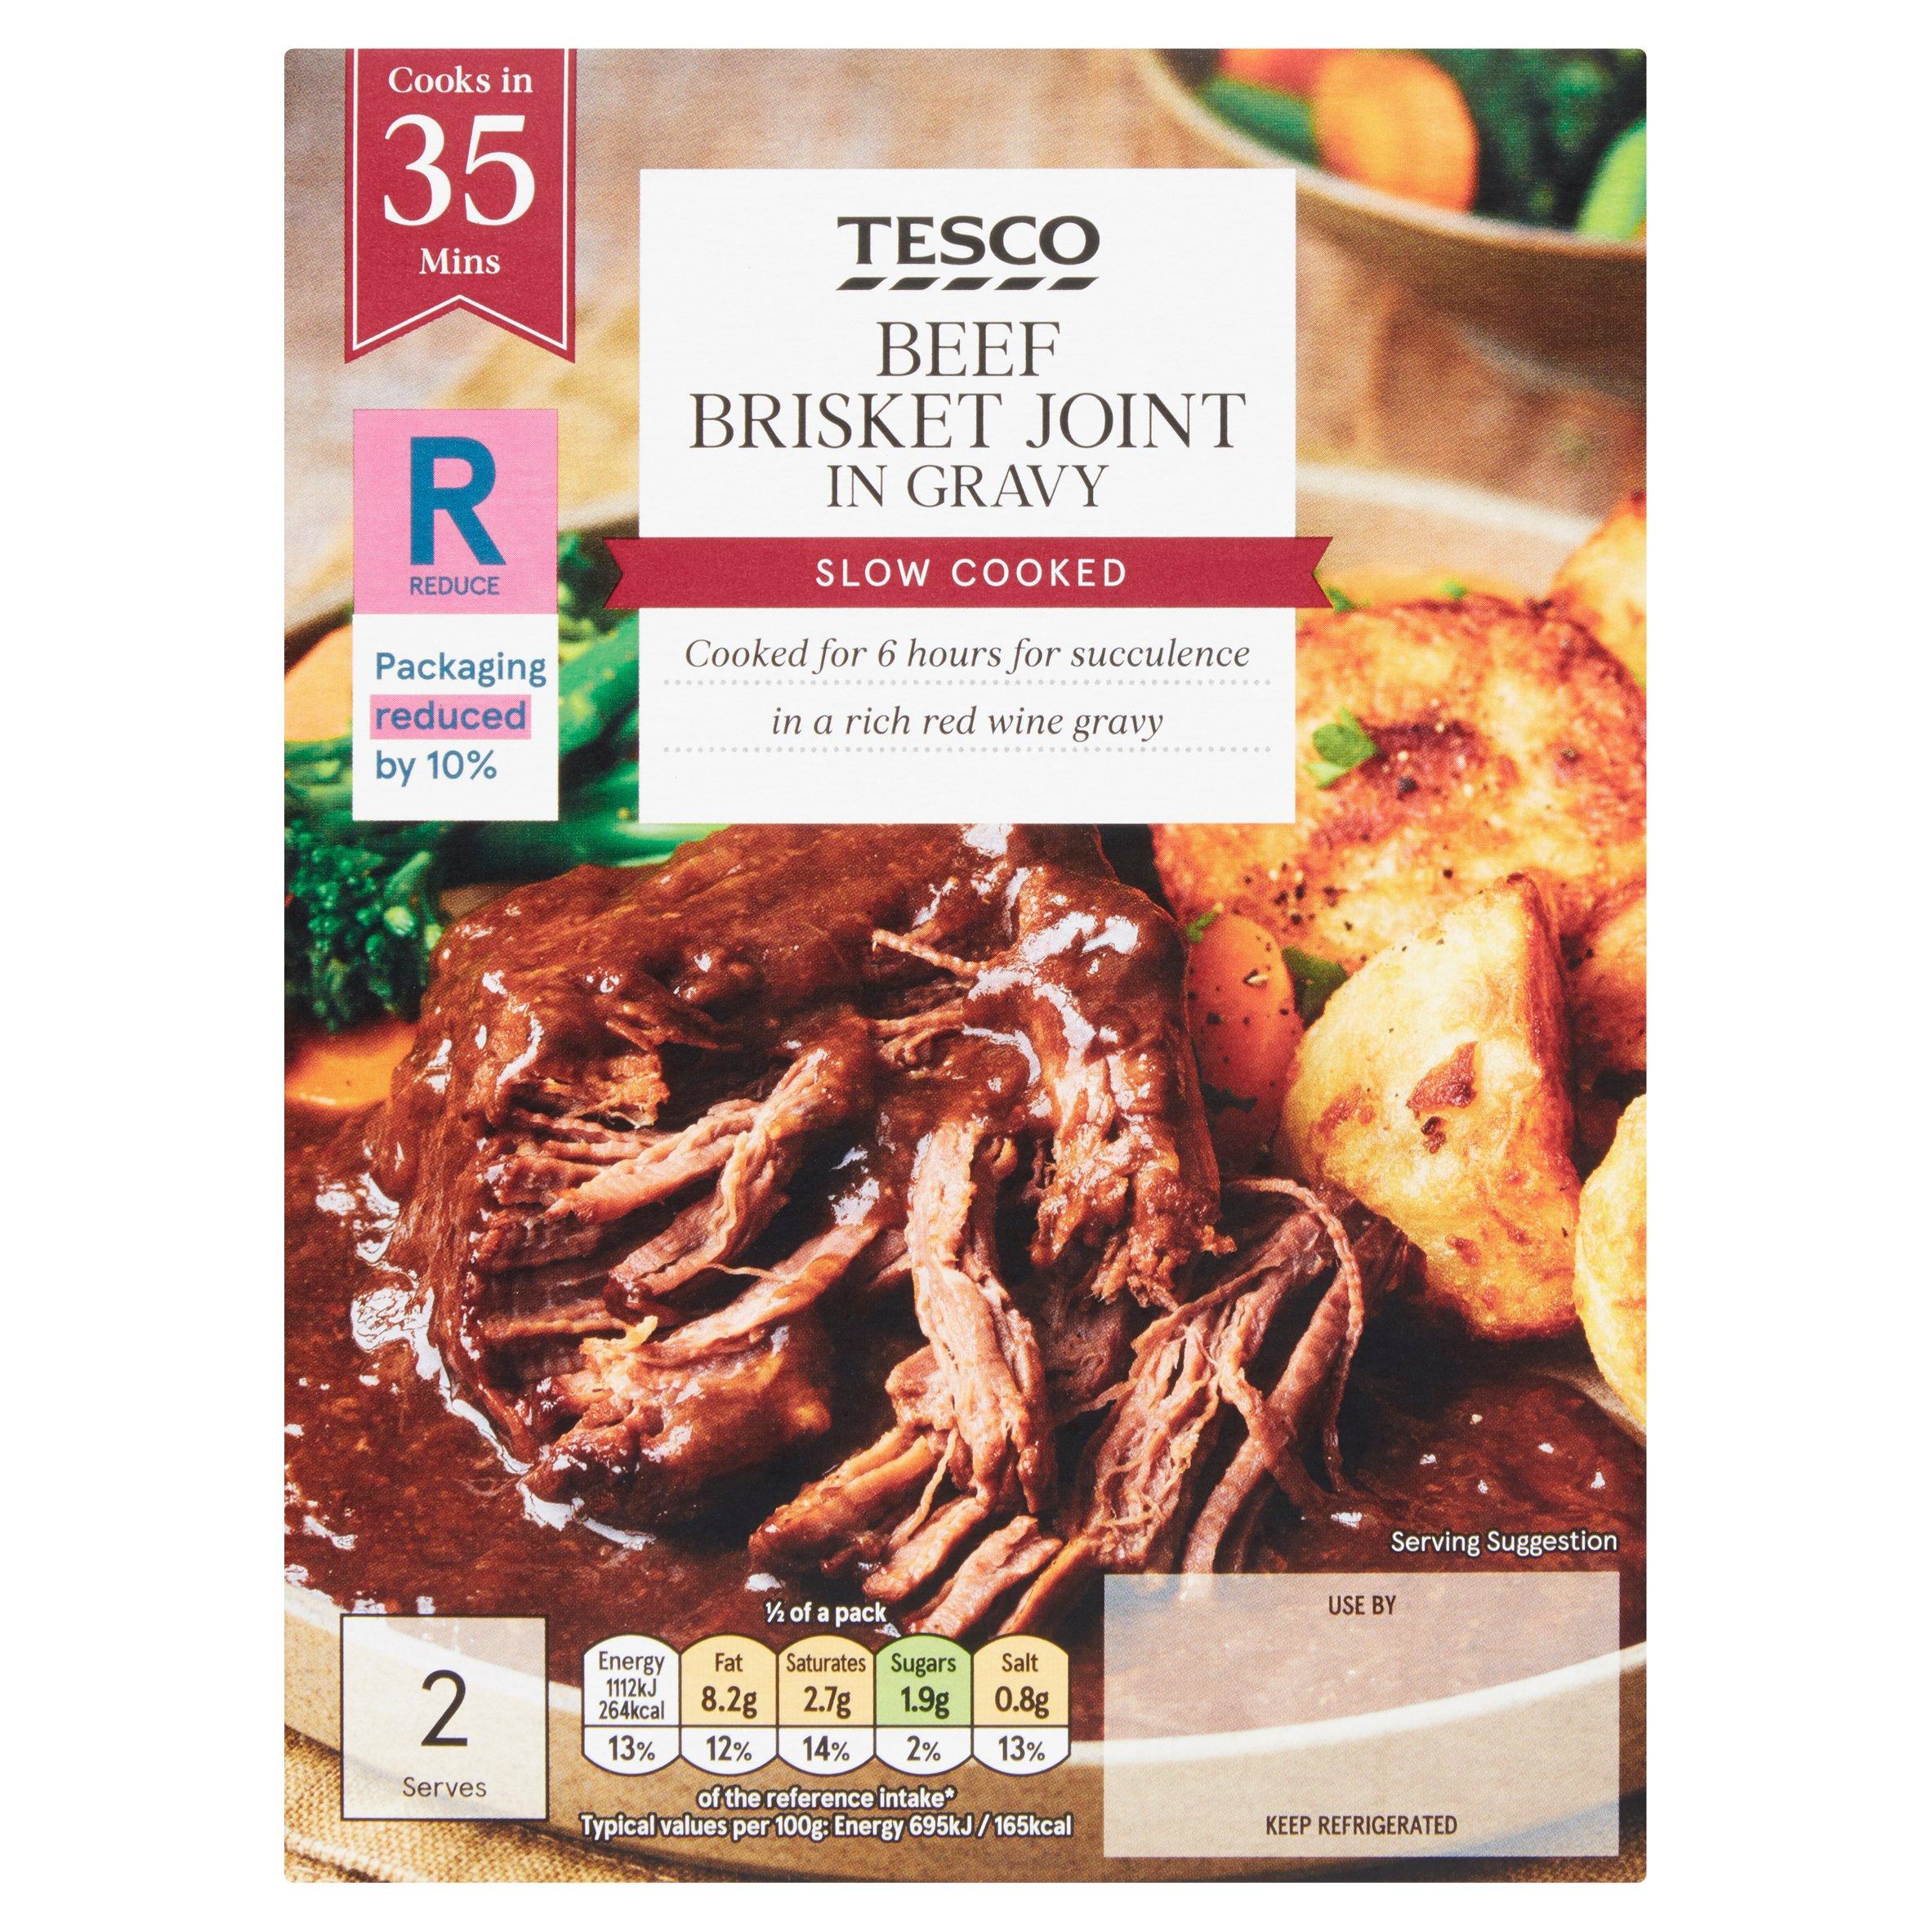 Tesco Beef Brisket Joint In Gravy 380G